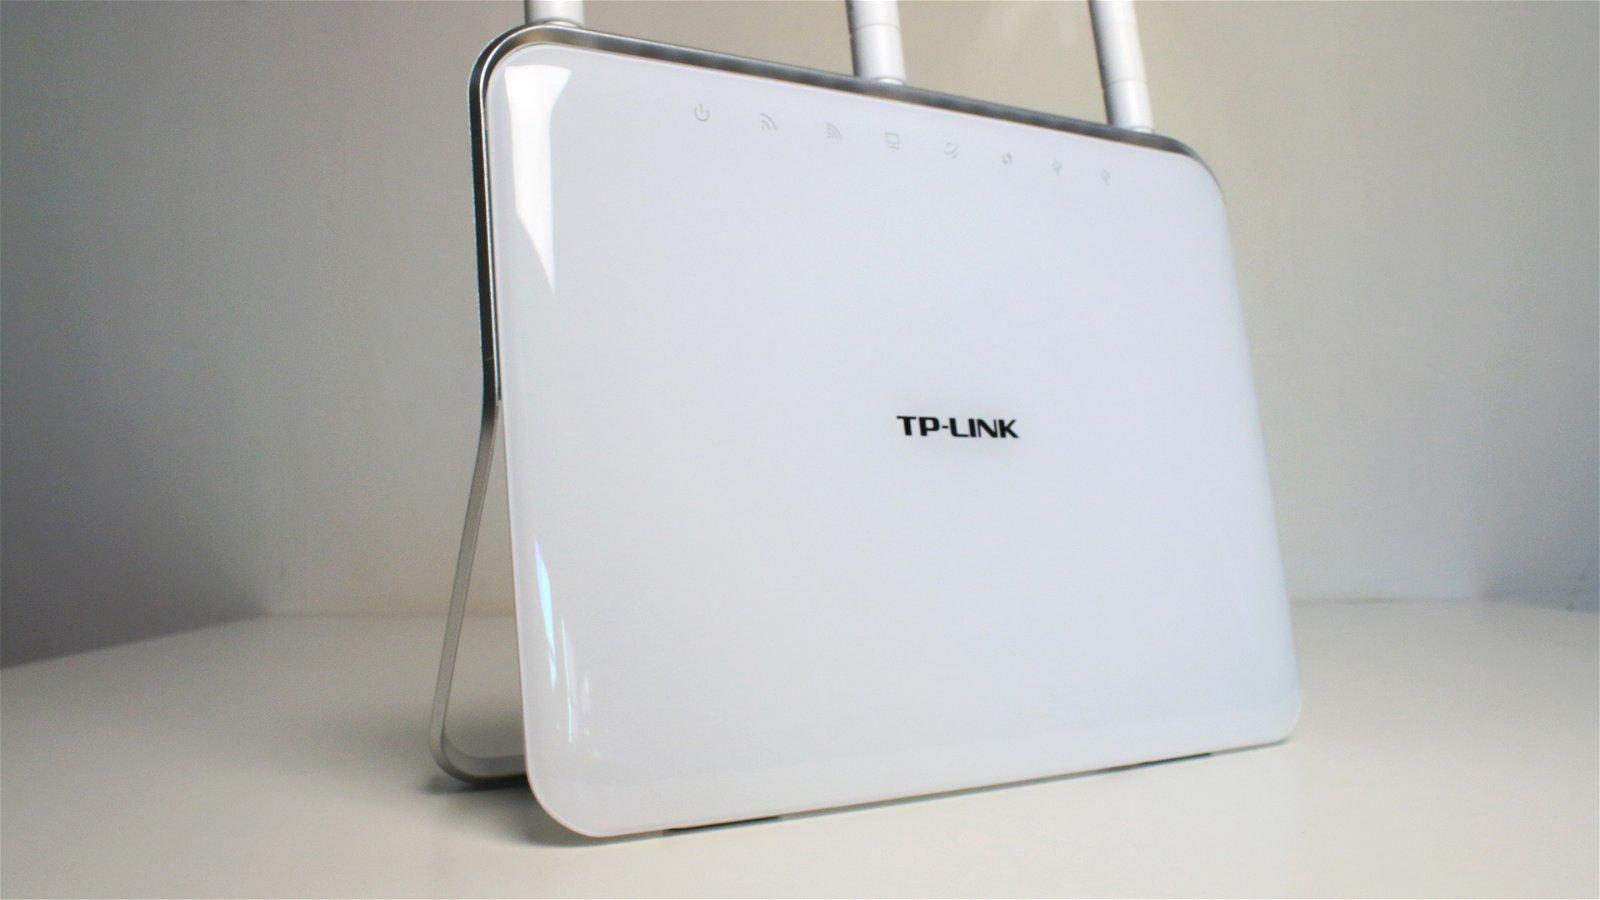 TP-Link Archer C9 AC1900 (Hardware) Review 1